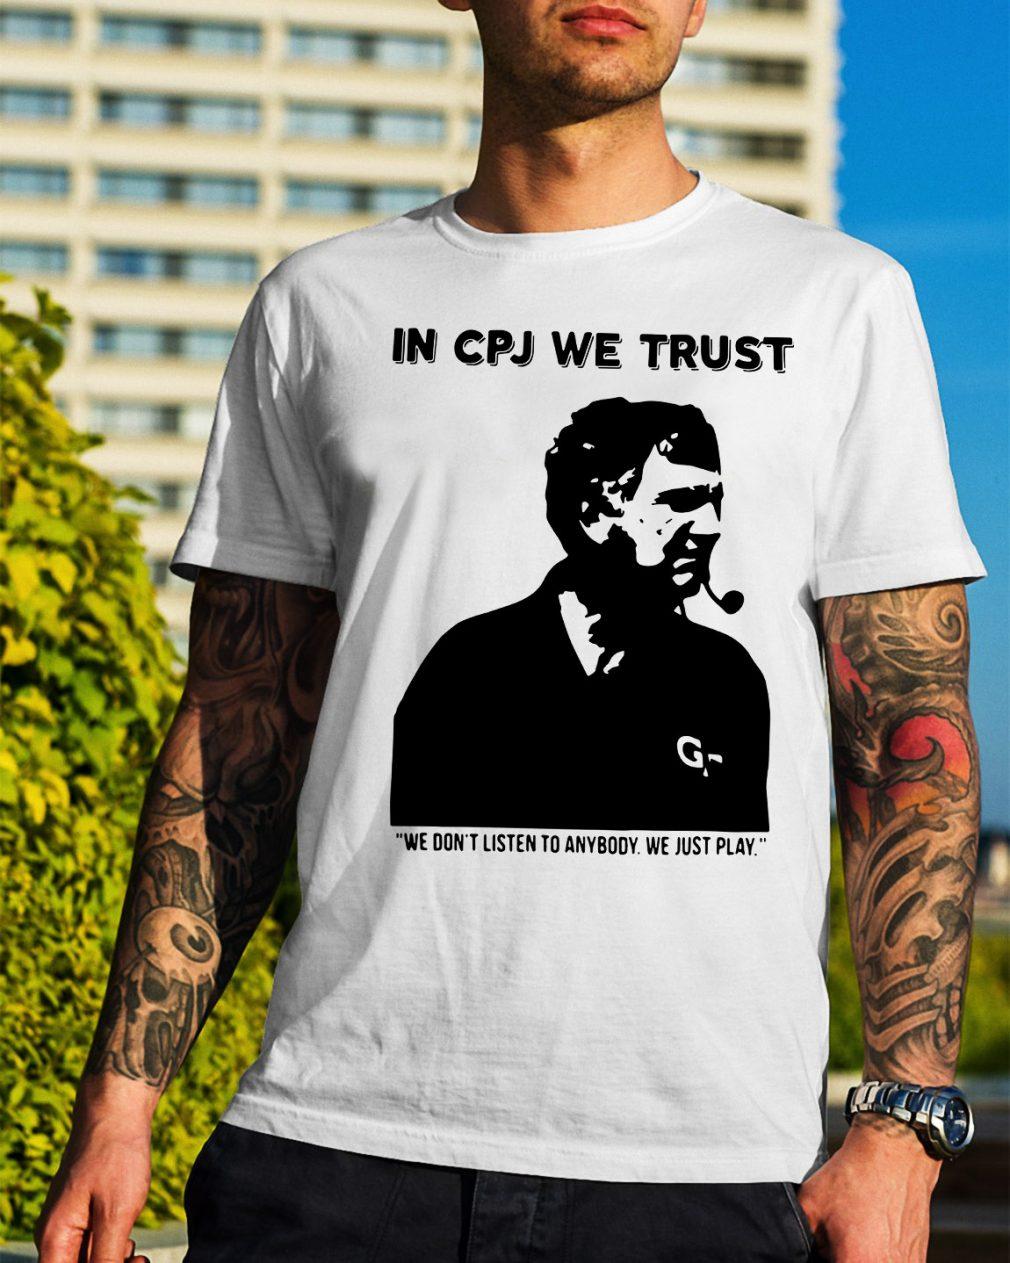 Wes Durham in CPJ we trust shirt we don't listen to anybody shirt